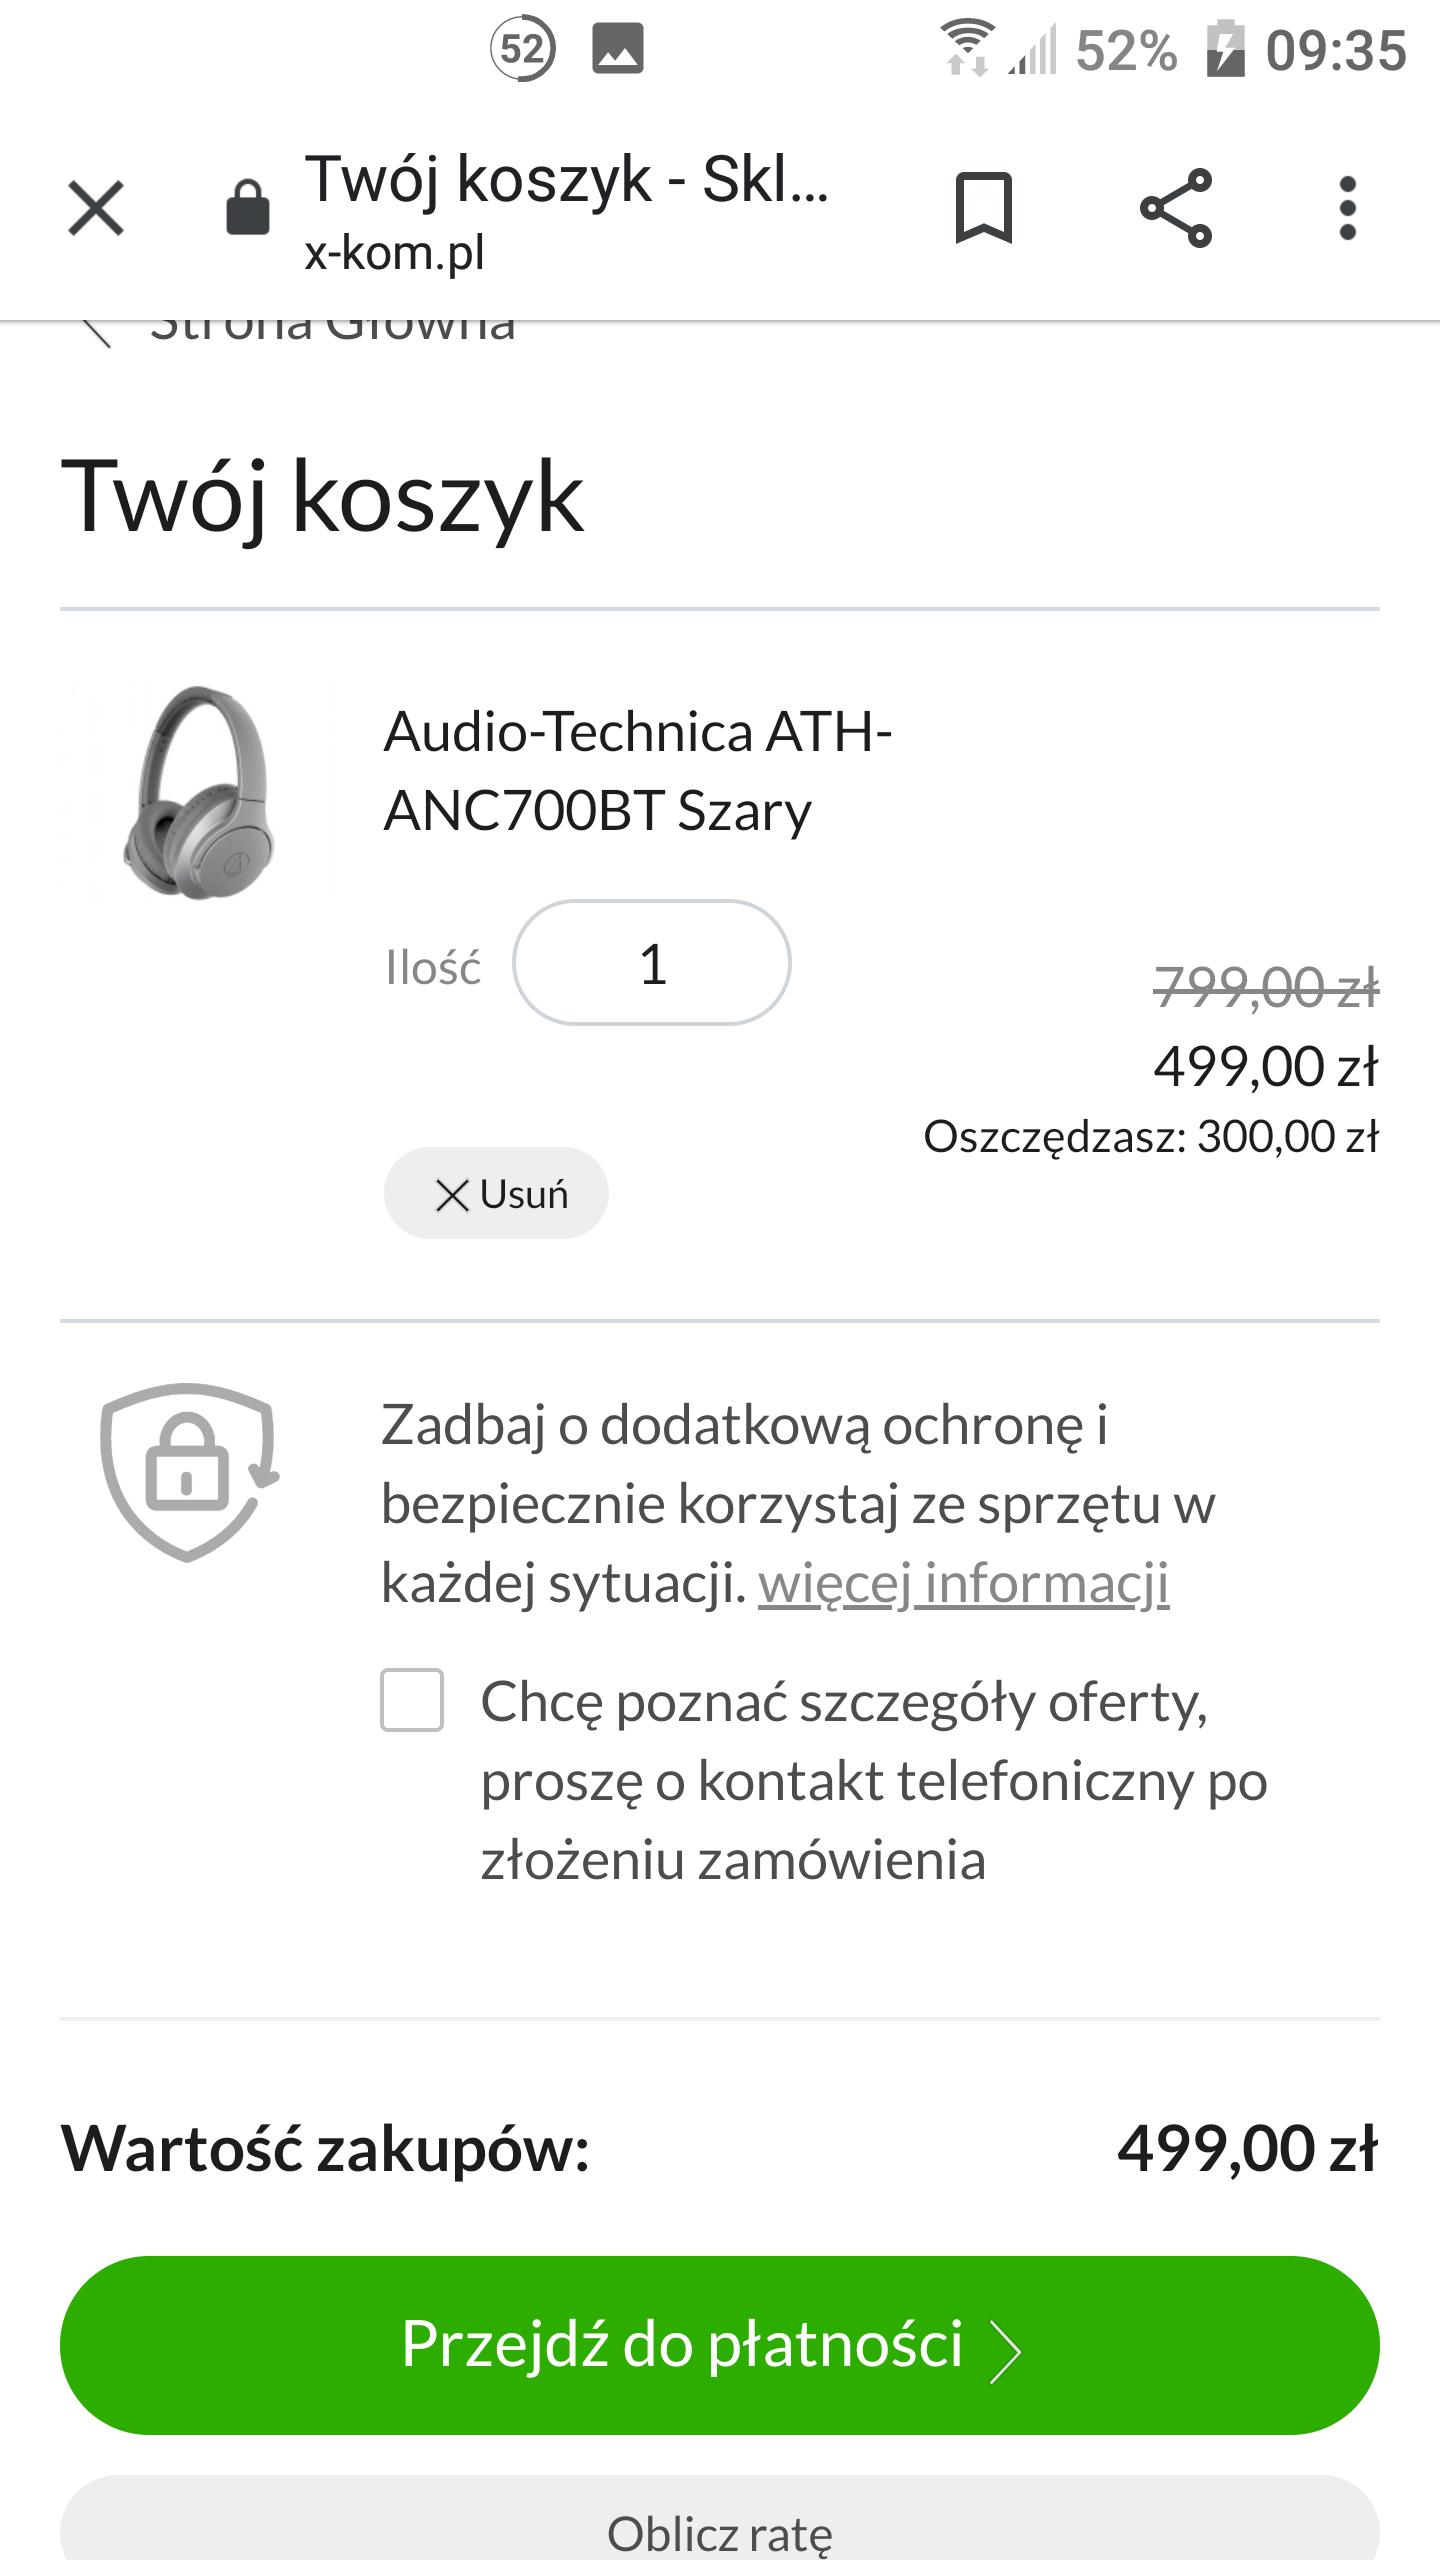 Audio-Technica ATH-ANC700BT  słuchawki